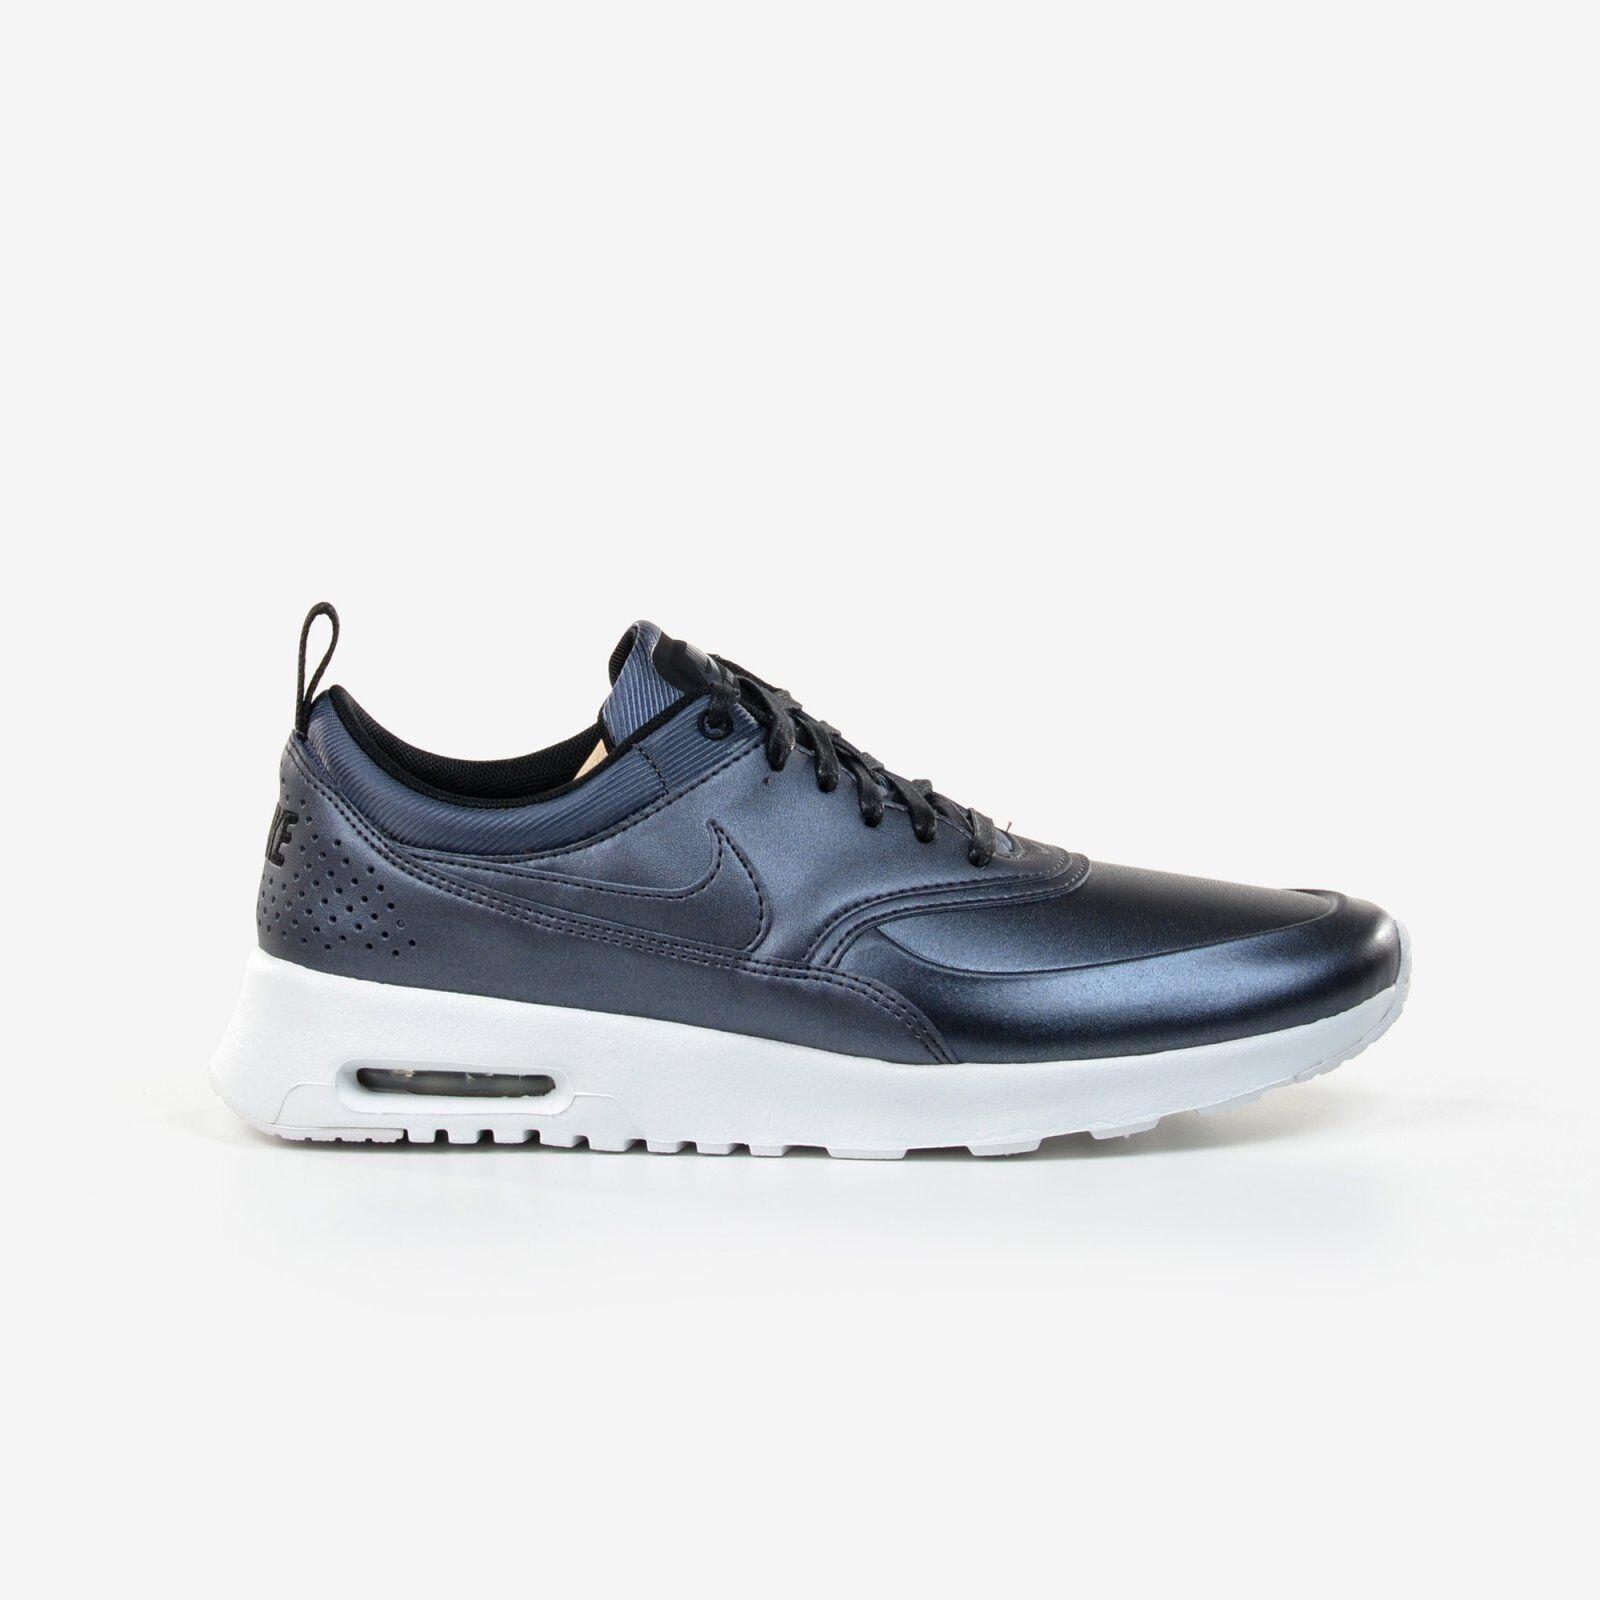 47ab71736f Nike Wmns Air Max Thea SE Metallic Hematite 2017 Dark Grey Running DS  861674-002 nodxlb2311-Athletic Shoes